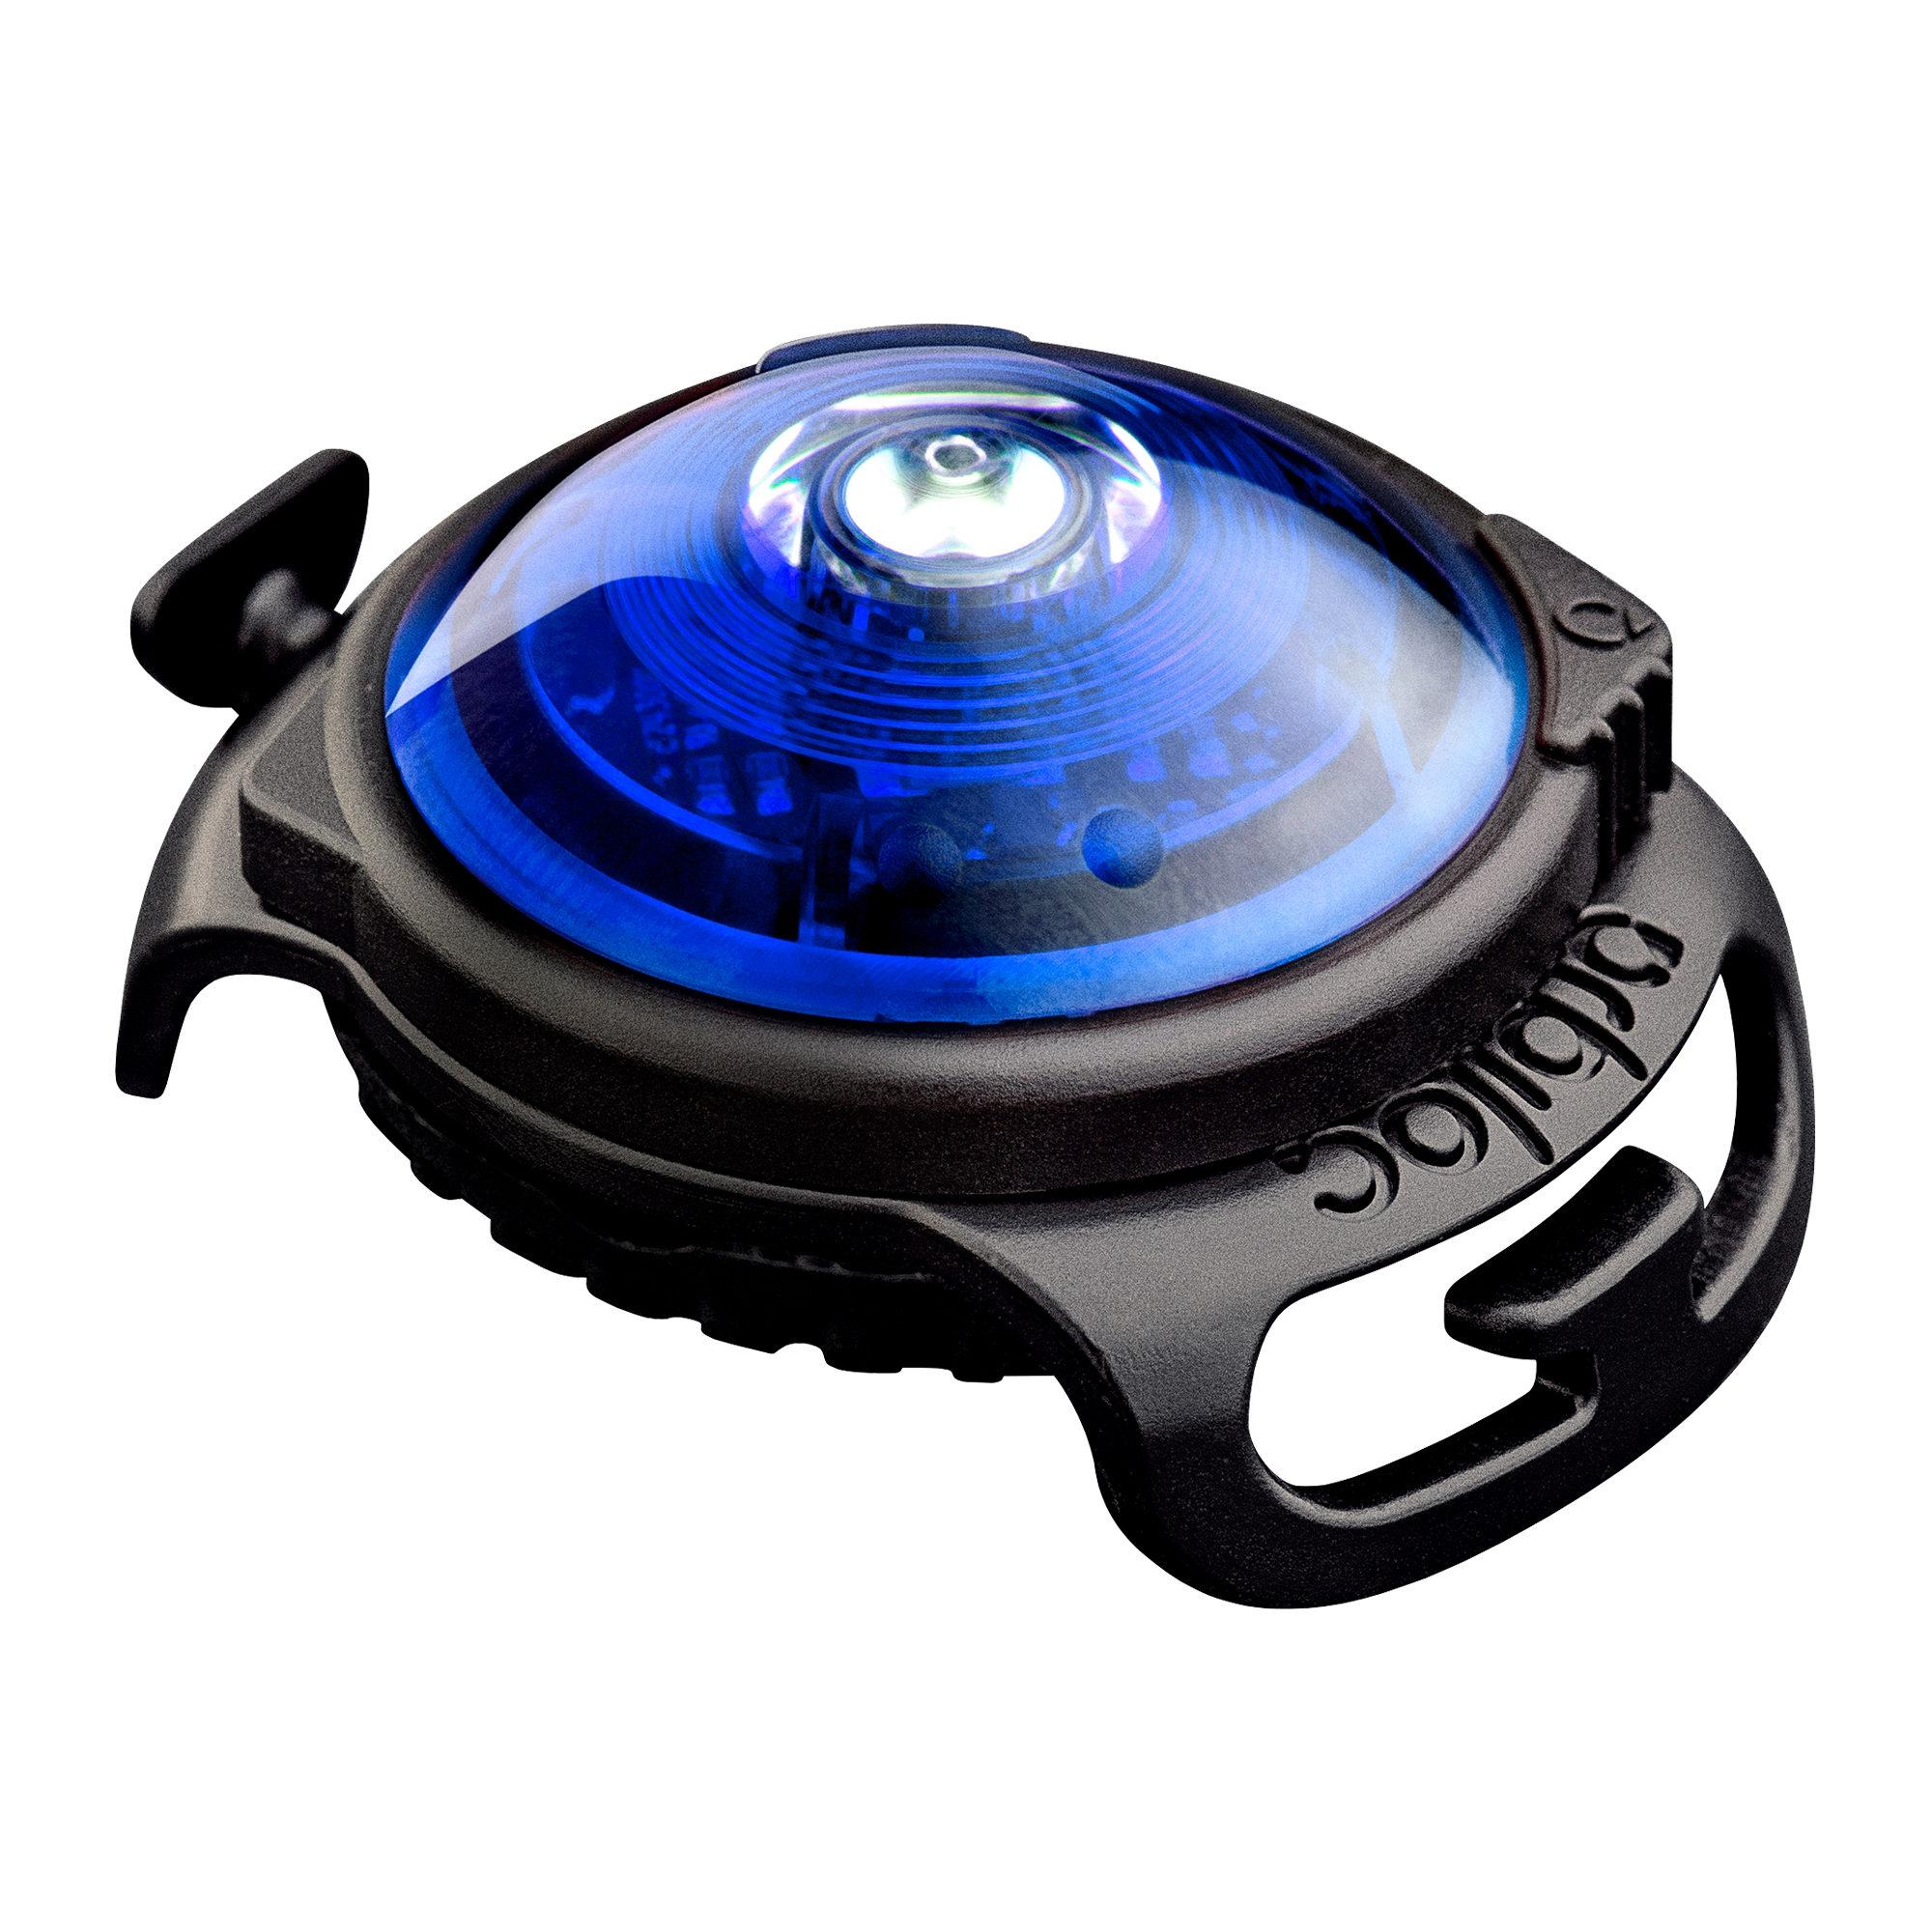 Orbiloc Dog Dual Safety Light - Blau